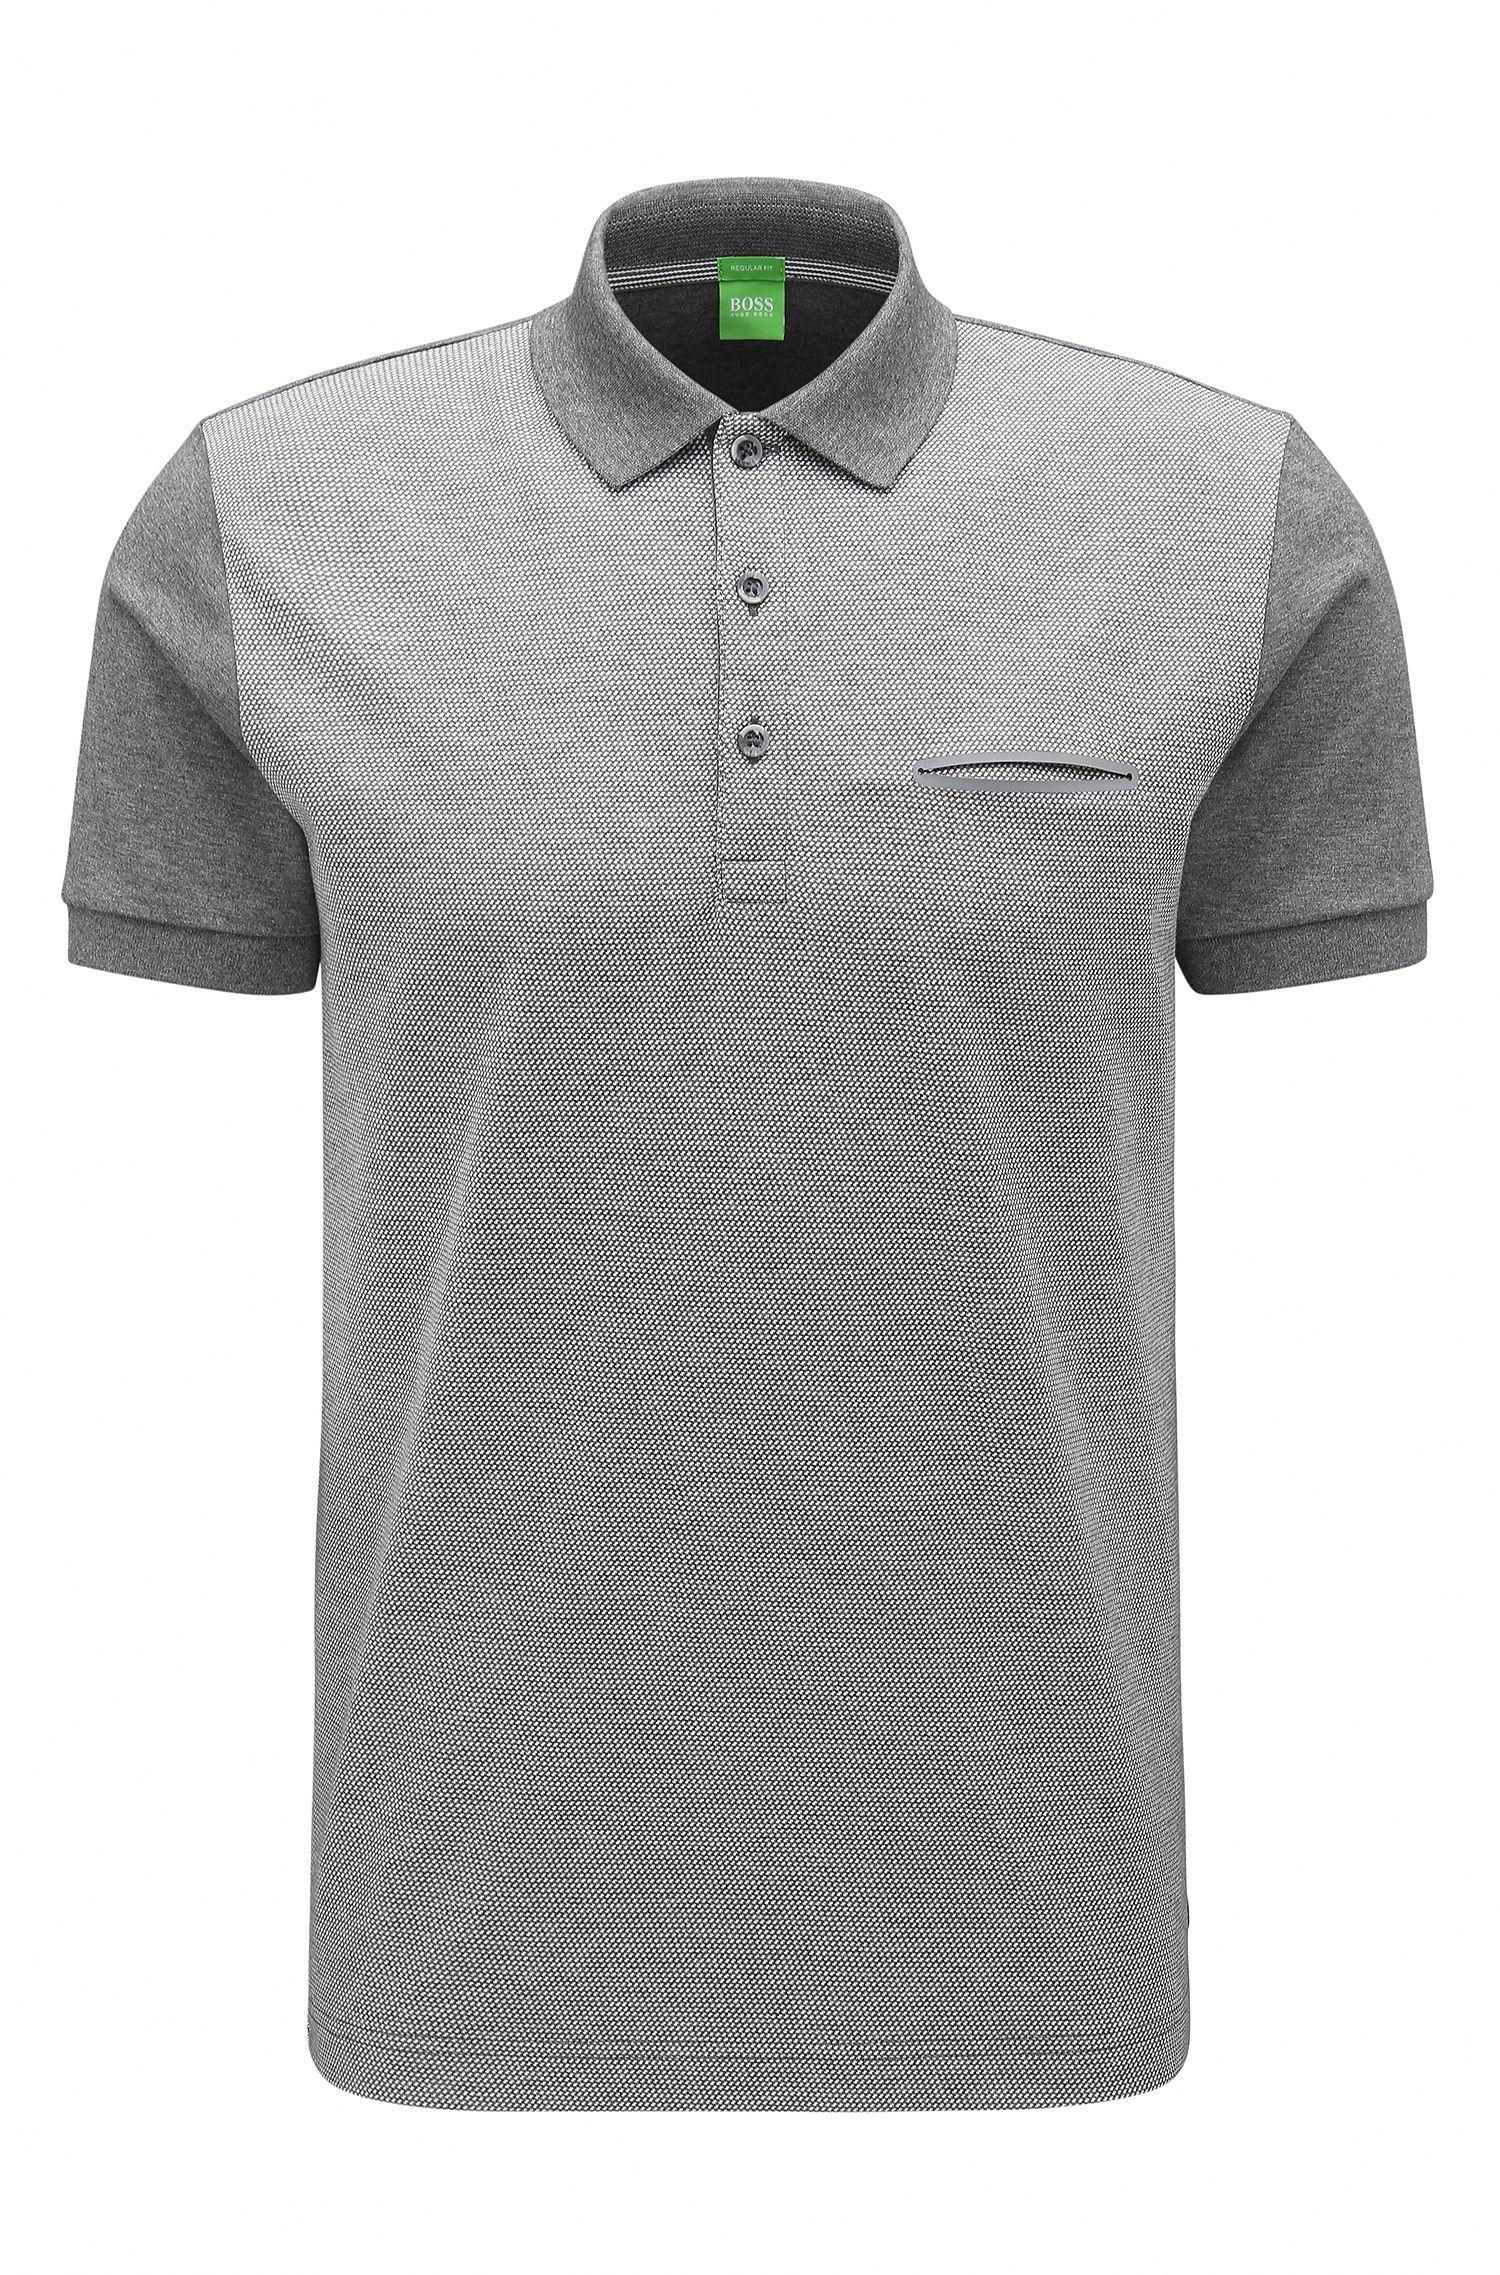 'C-Firenze'   Regular Fit, Gradient Striped Cotton Polo